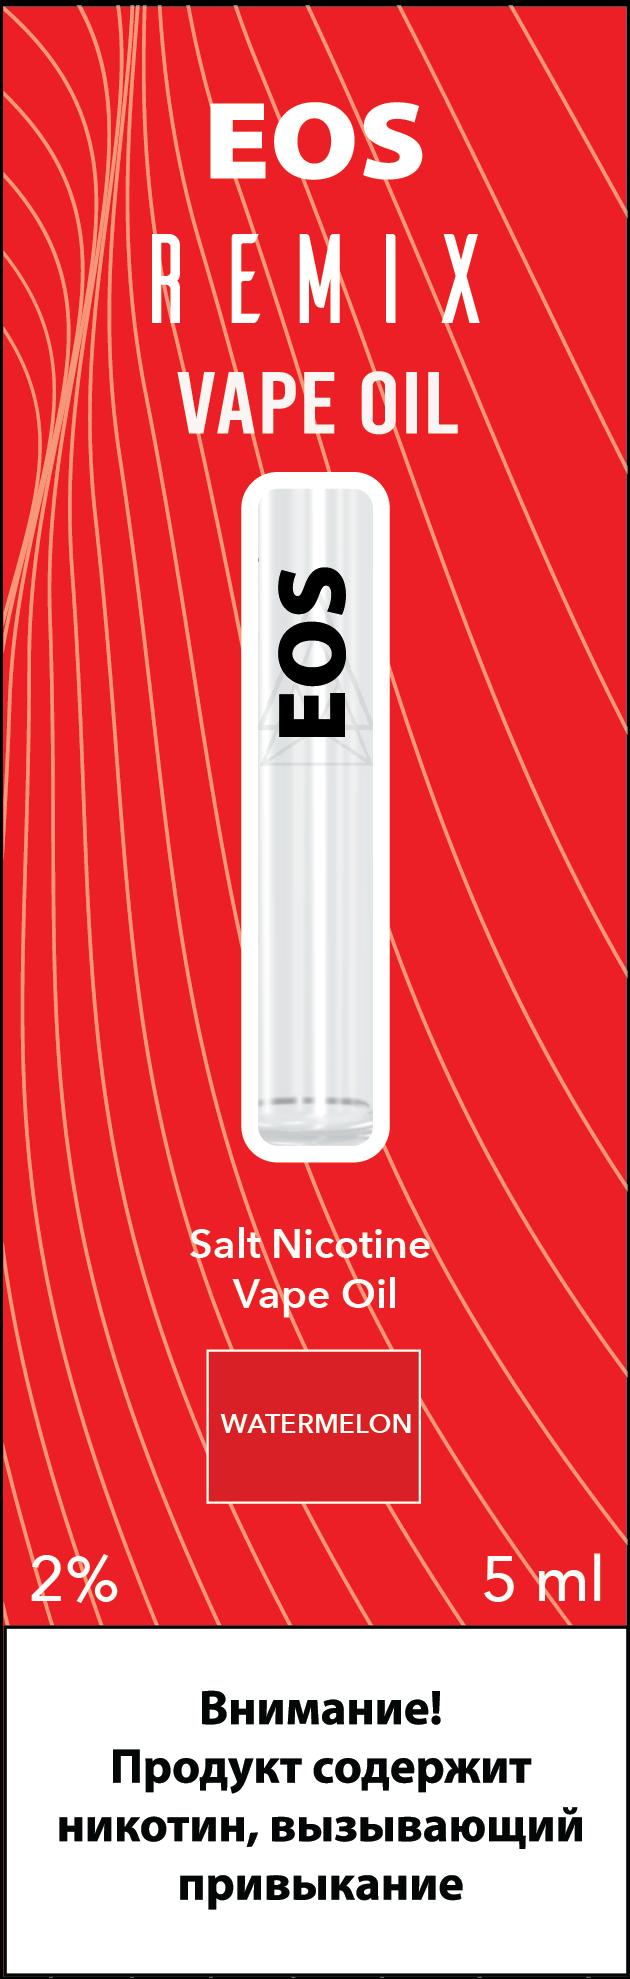 EOS REMIX SALT NIC WATERMELON 2% 5ml